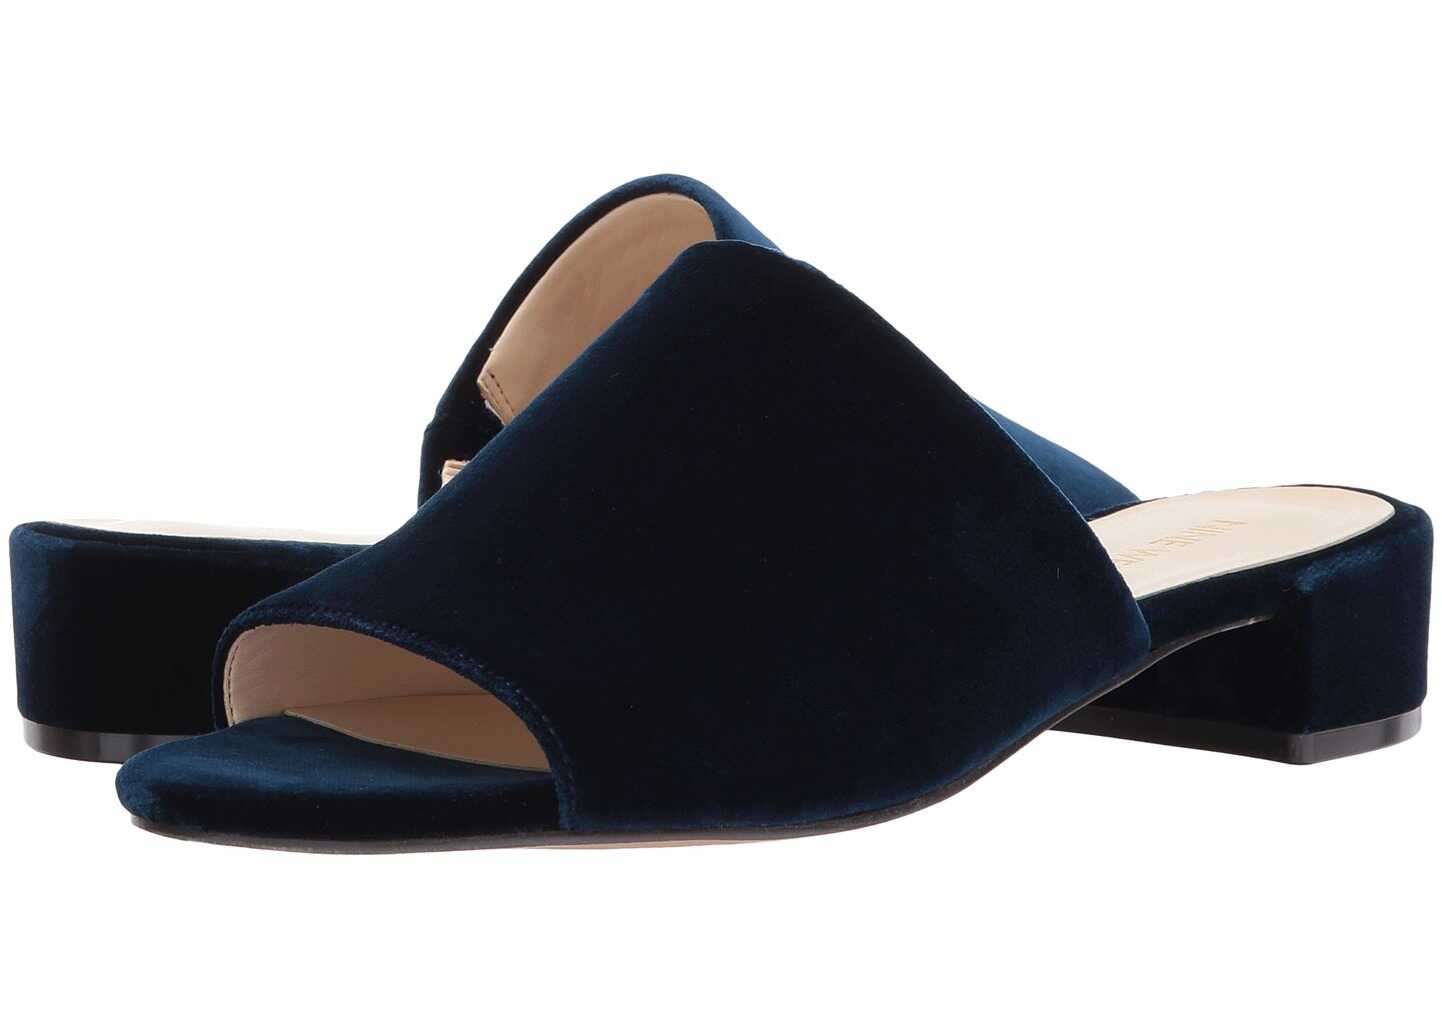 Nine West Raissa Slide Sandal Navy Fabric